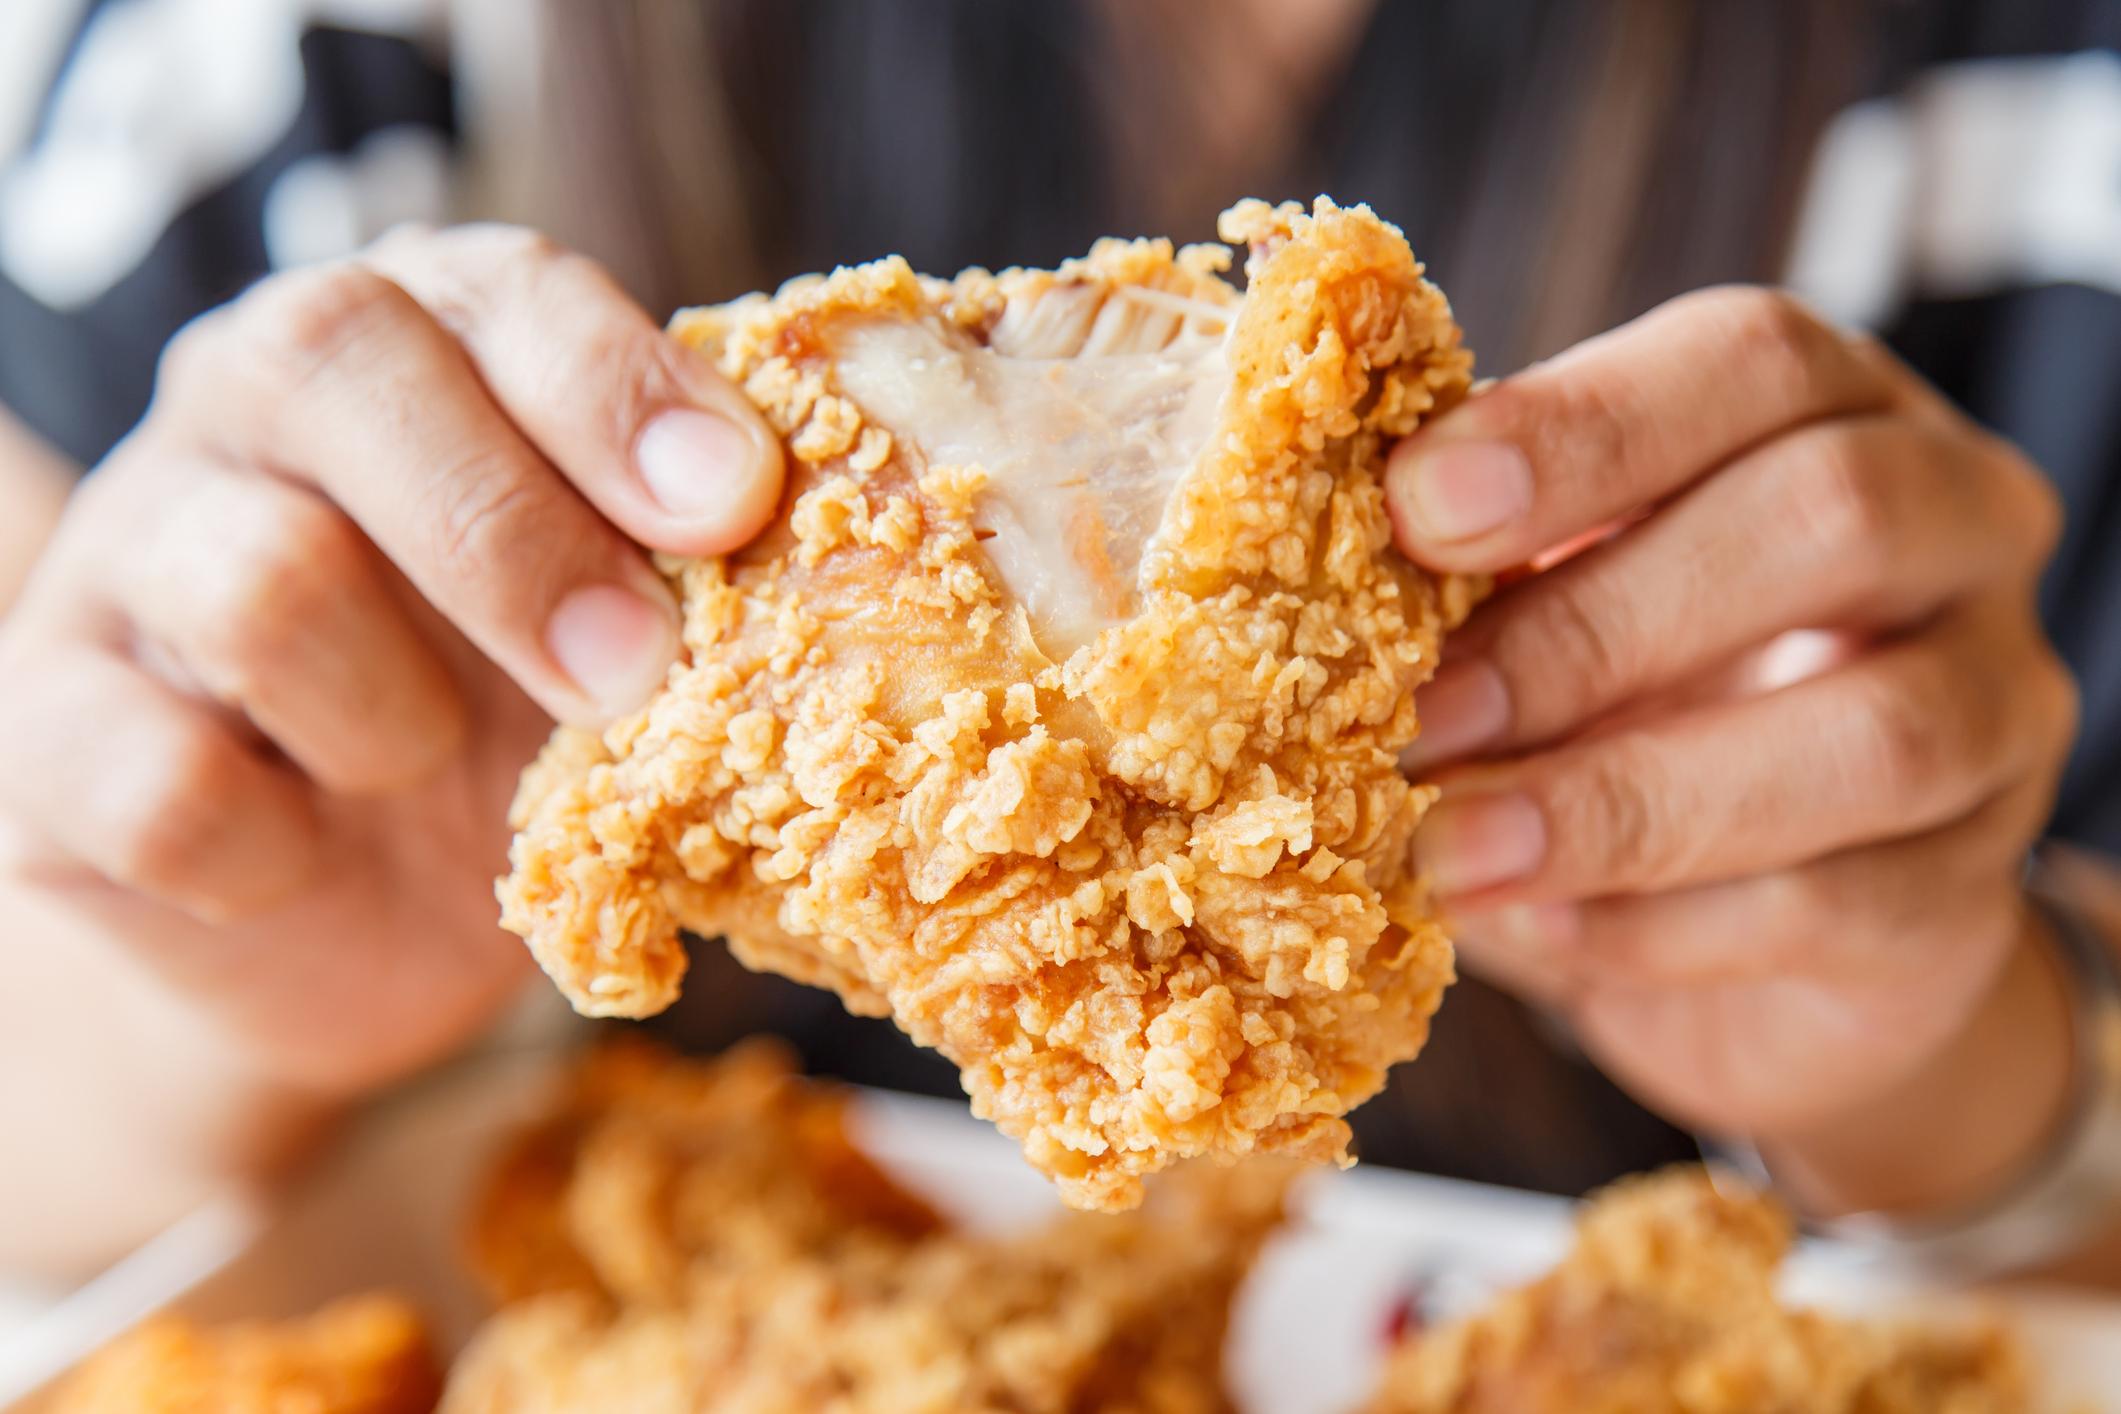 A piece of fried chicken.